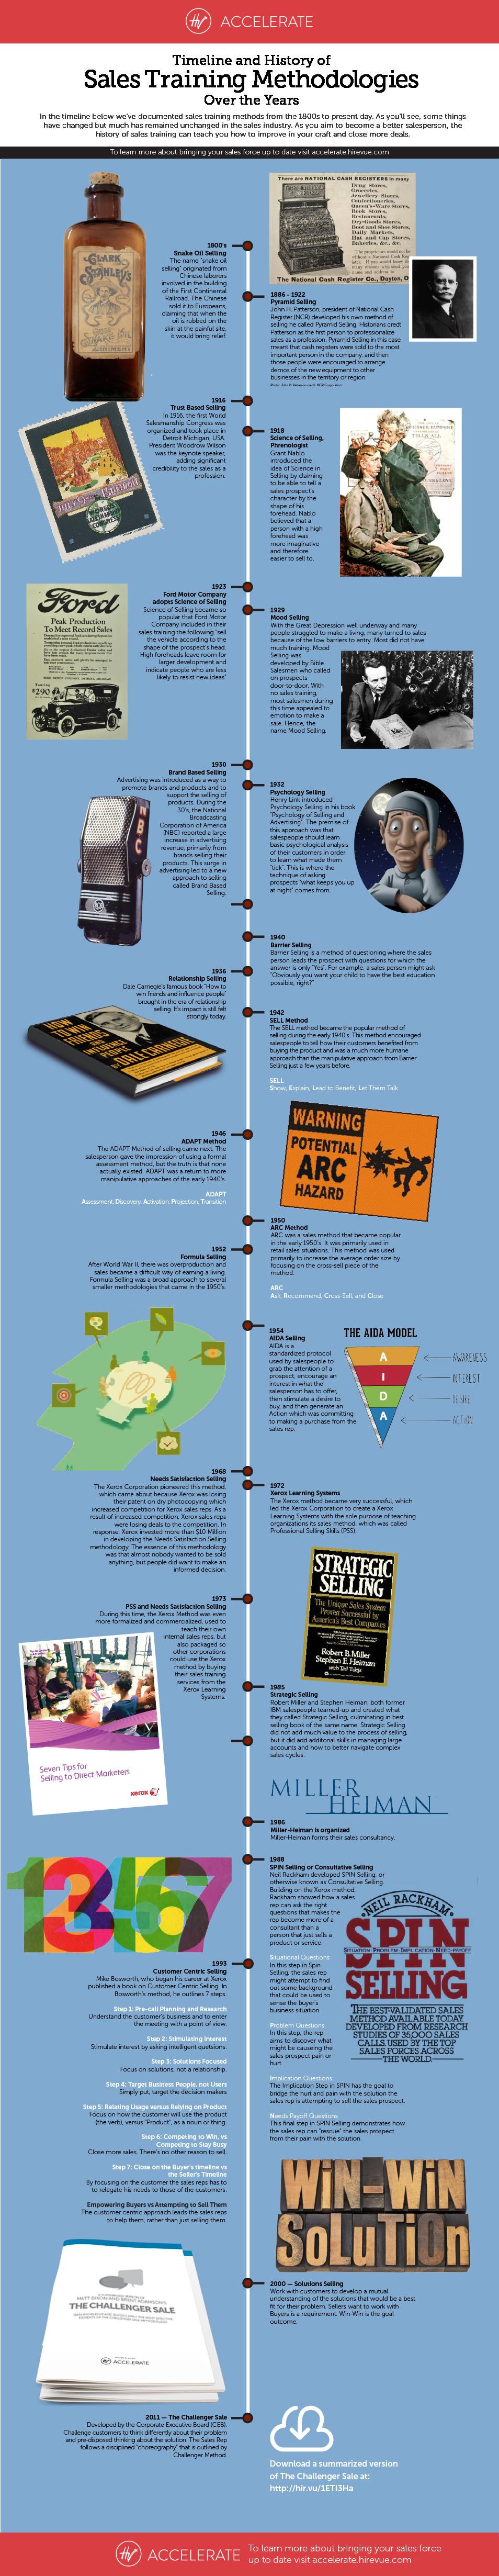 infographic-sales-methodologies-timeline.png